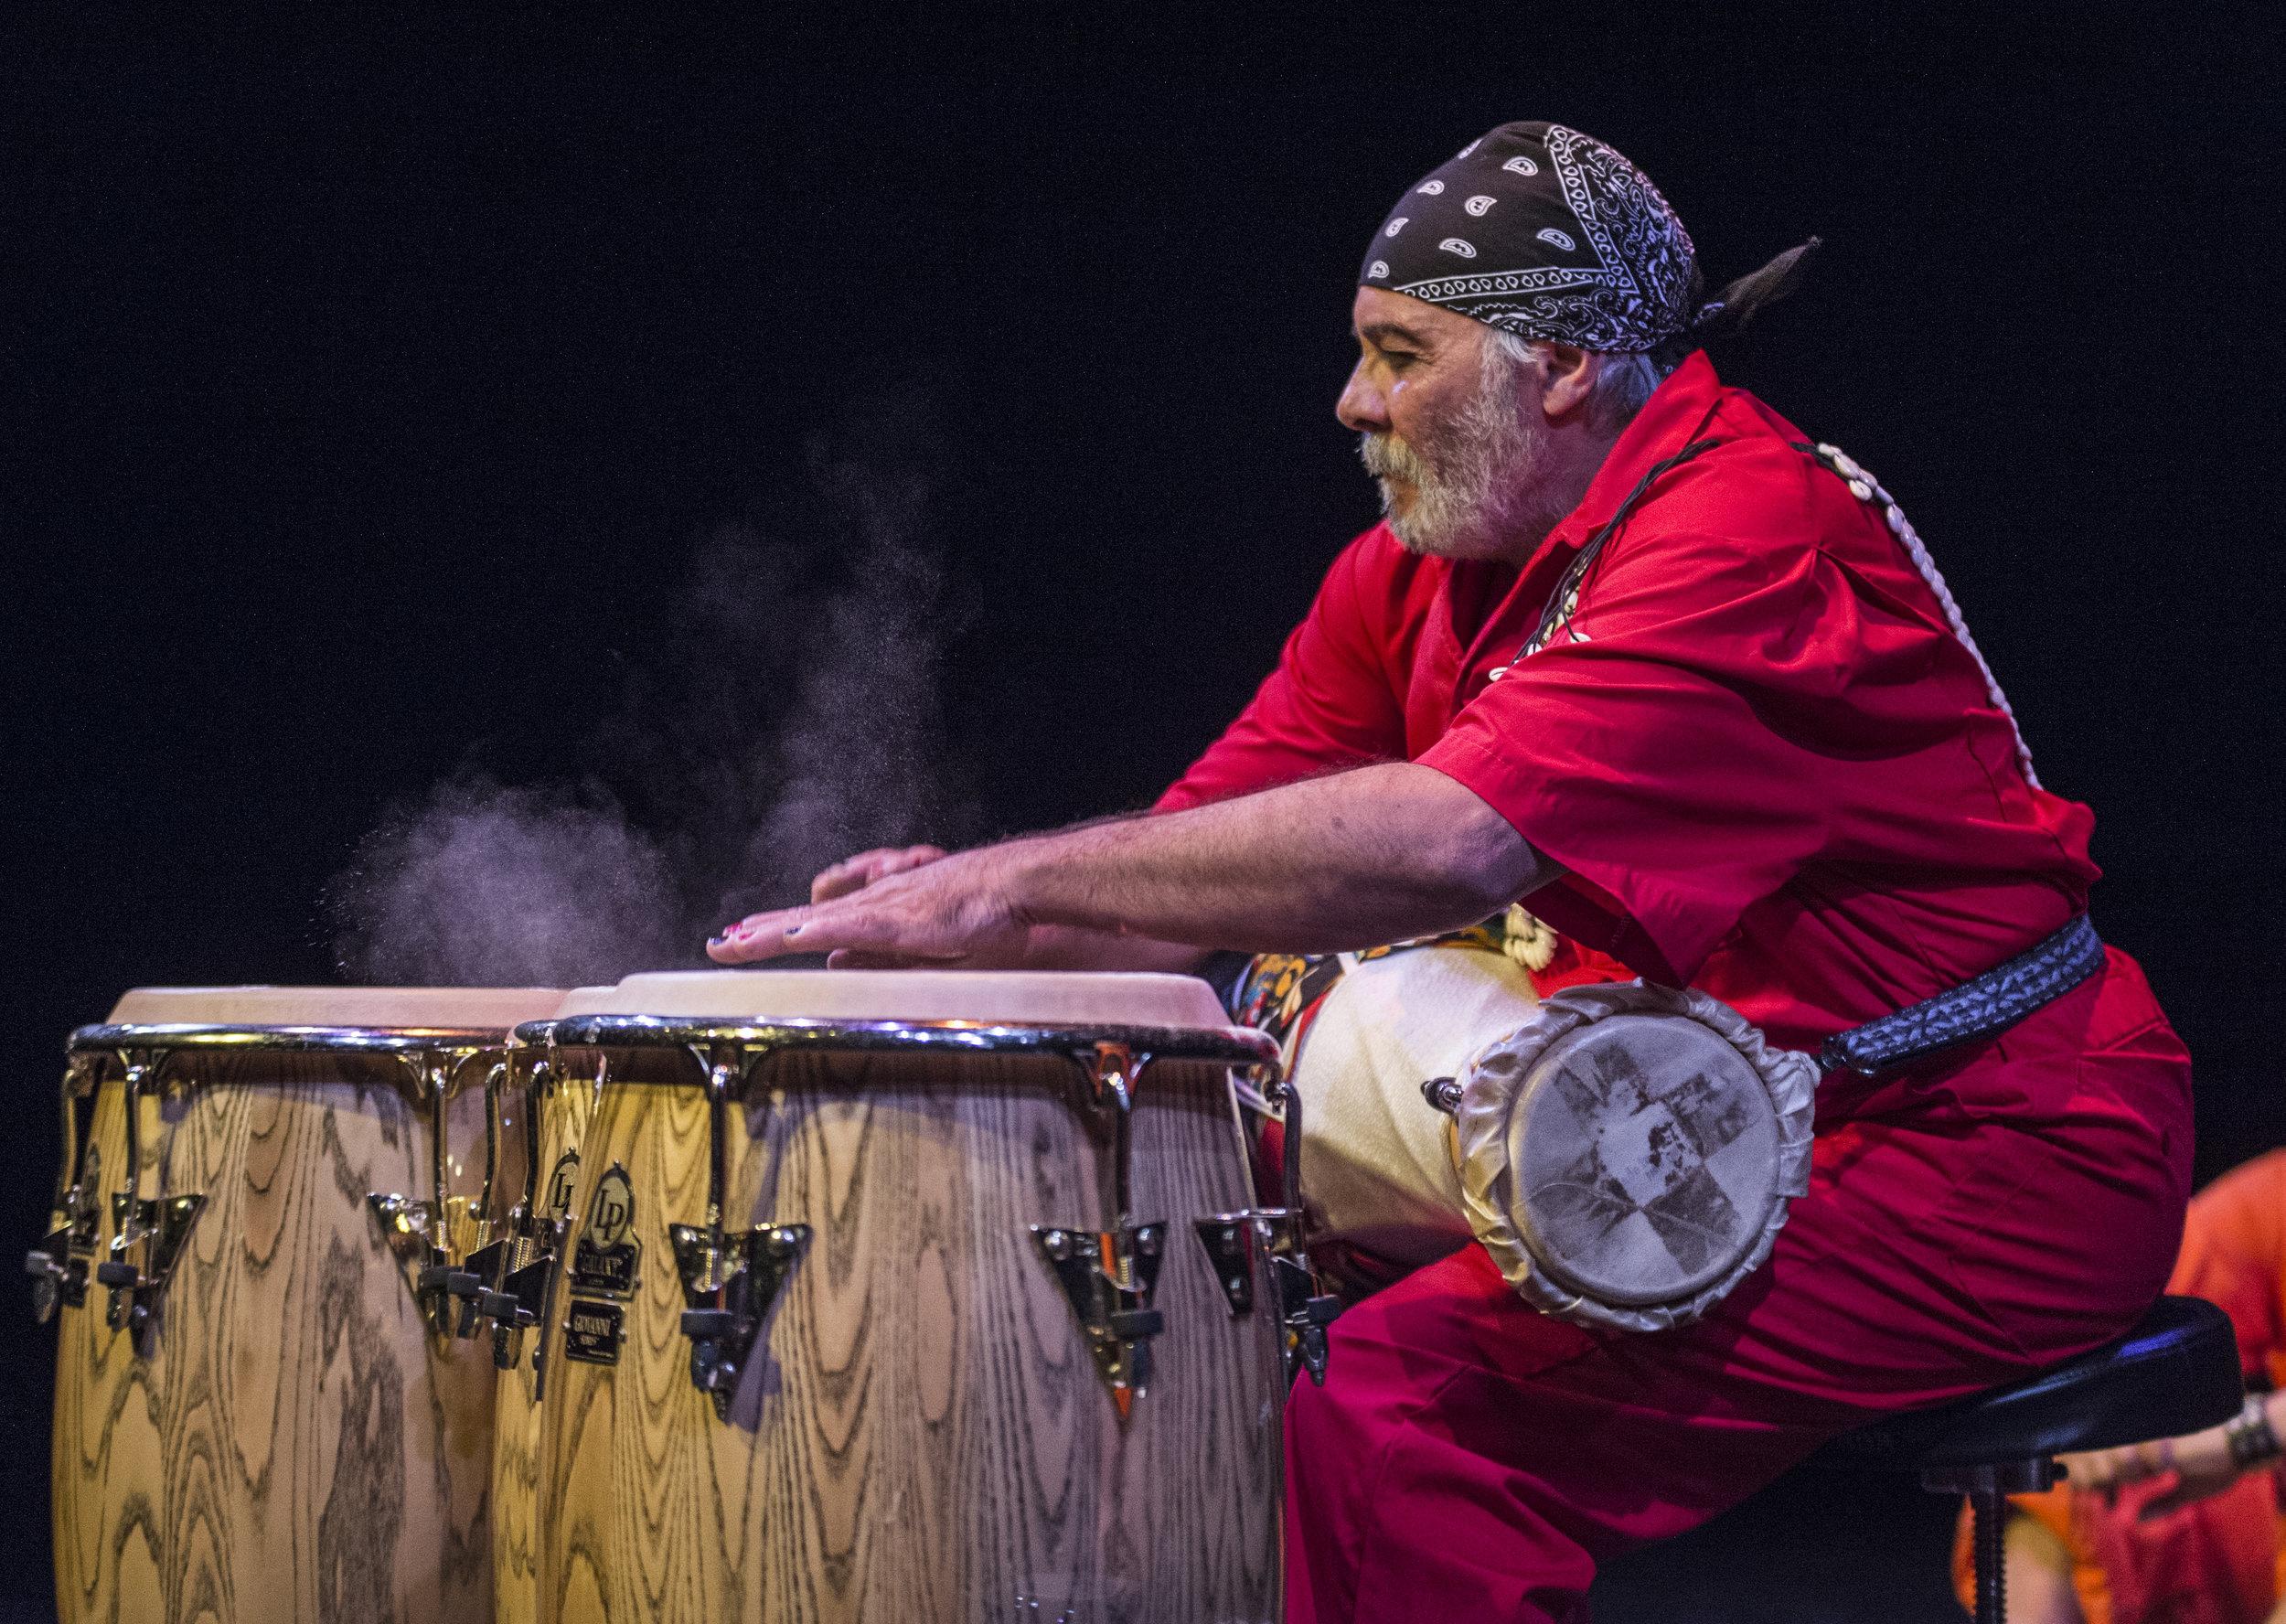 Angel Ruben Rodriguez, Sr. - Percussionist/Performer/Writer